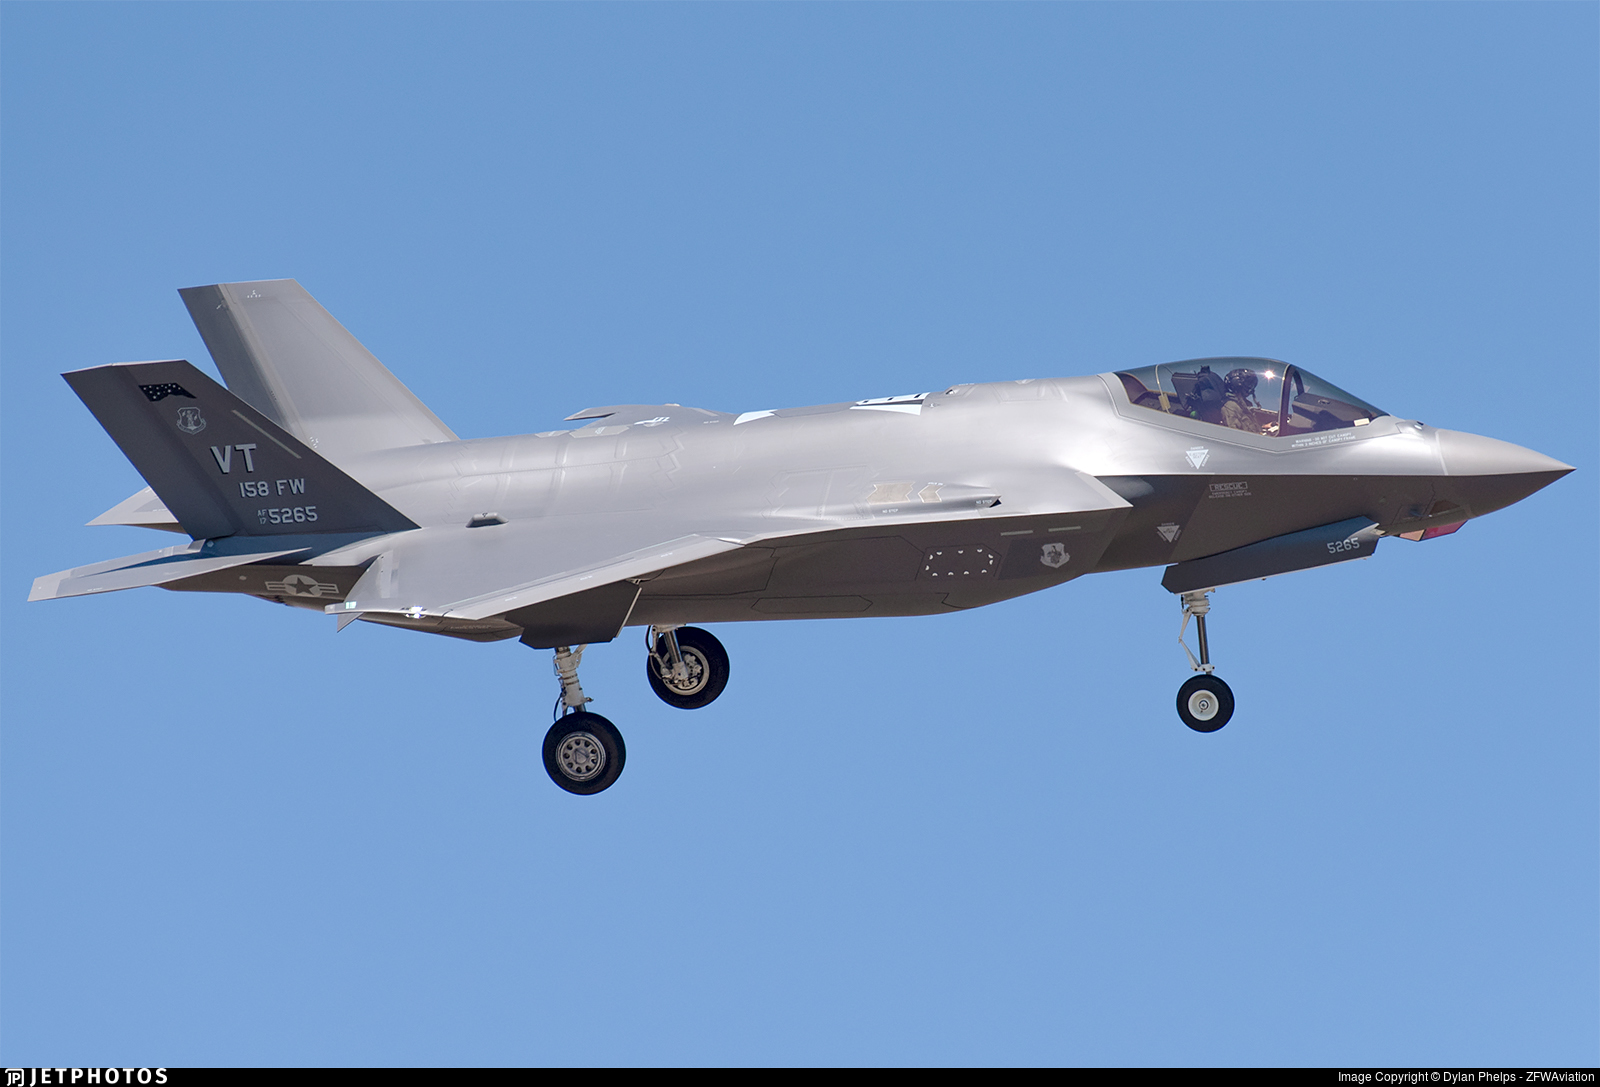 17-5265 - Lockheed Martin F-35A Lightning II - United States - US Air Force (USAF)